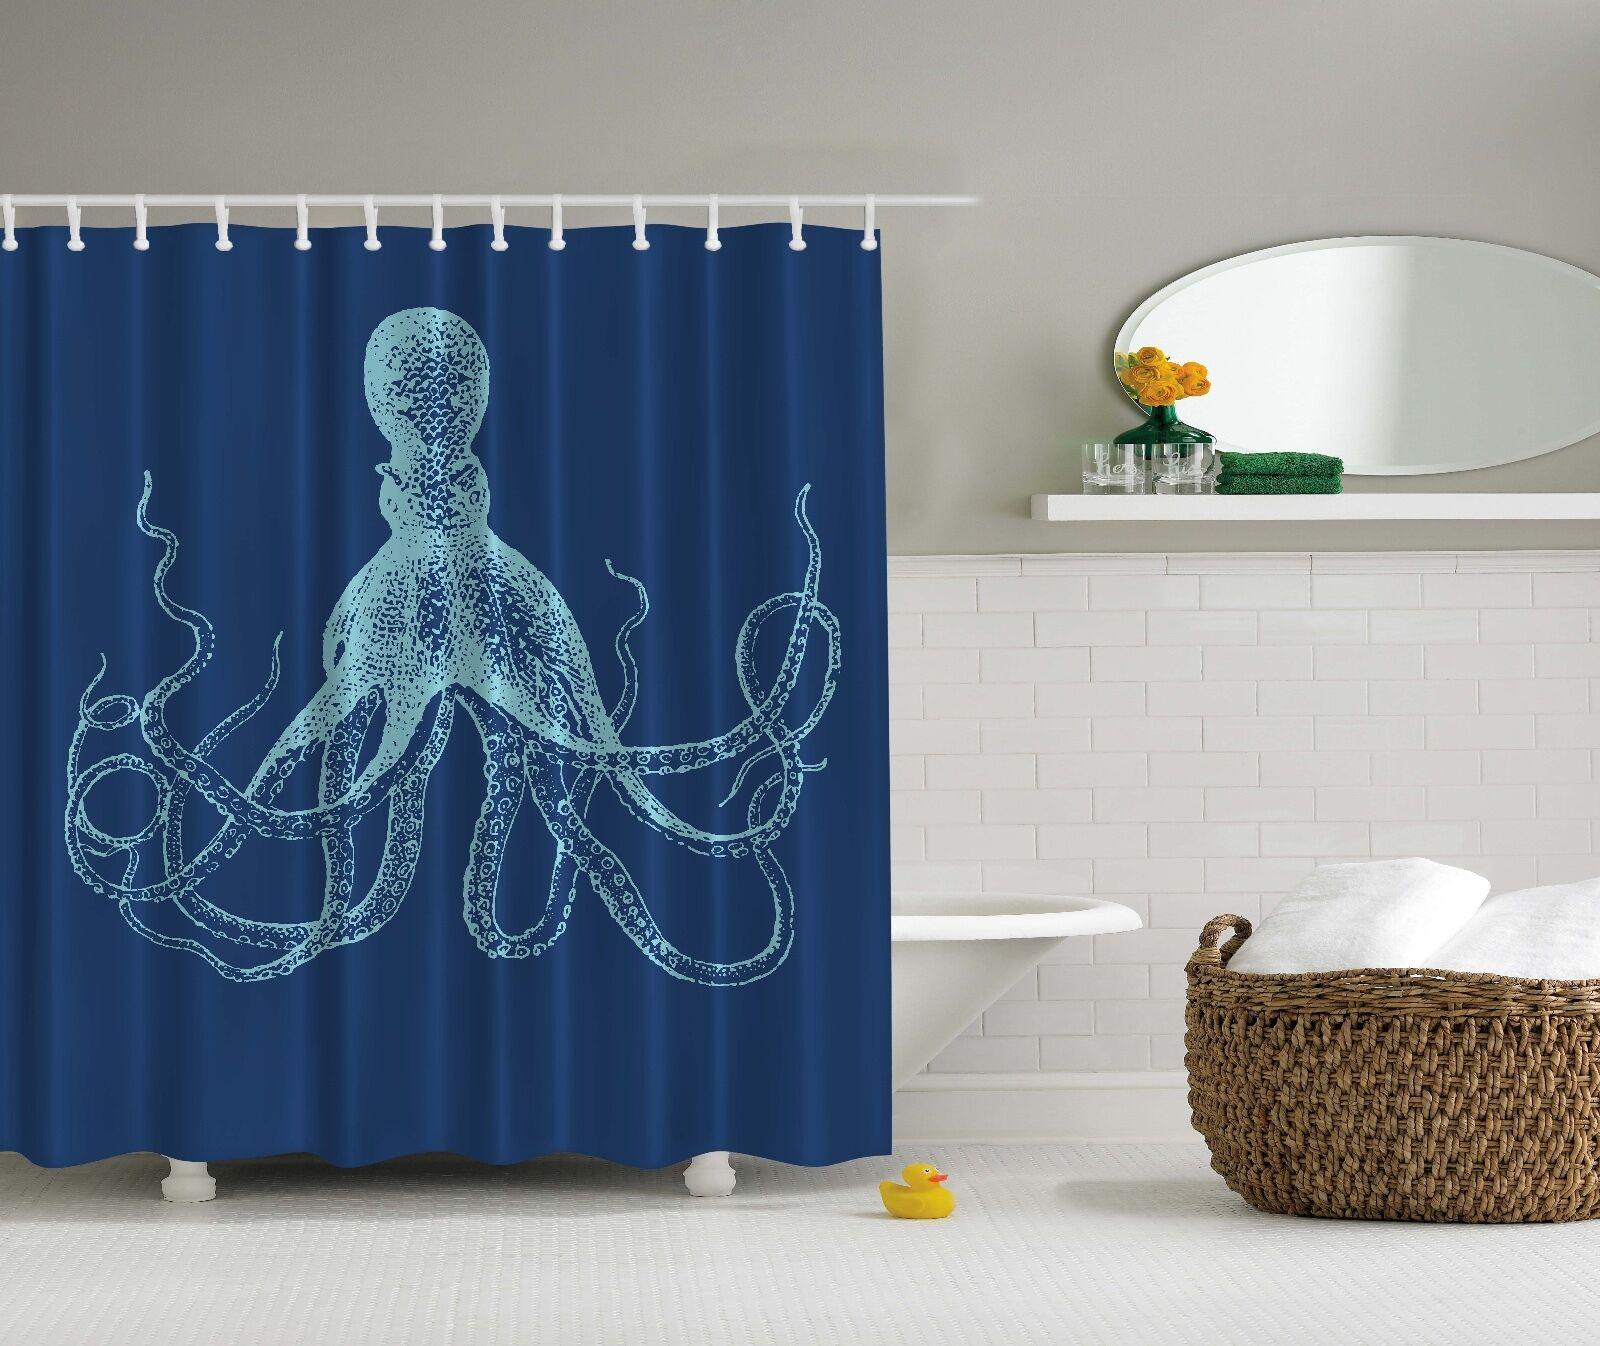 Blue Octopus Nautical Sea Ocean Beach Fabric Shower Curtain Digital Art Bathroom